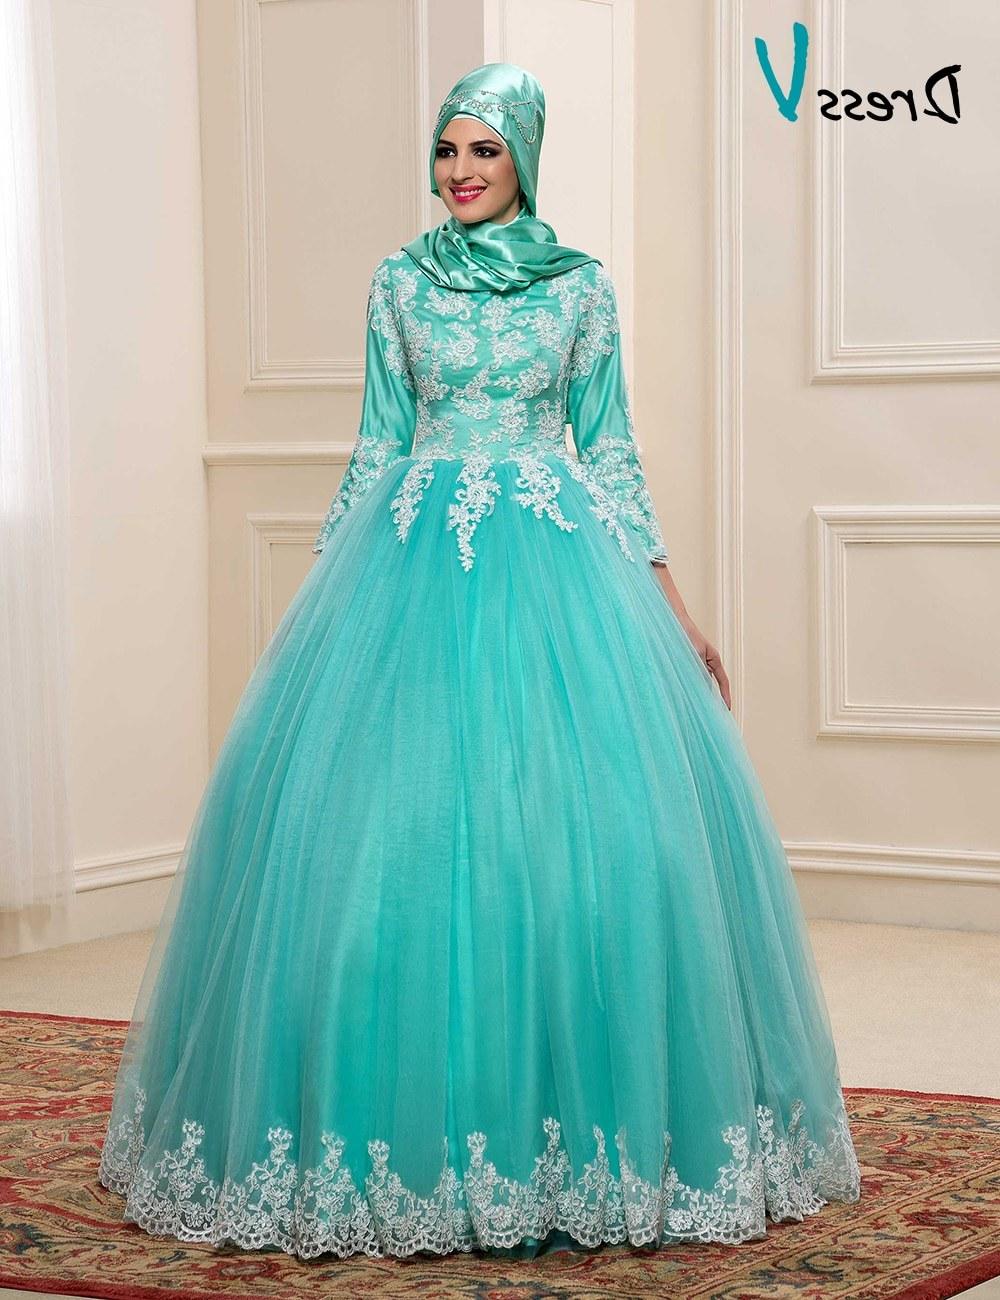 Ide Baju Pengantin Muslim Modern Tldn Bride Dresses Colors – Fashion Dresses